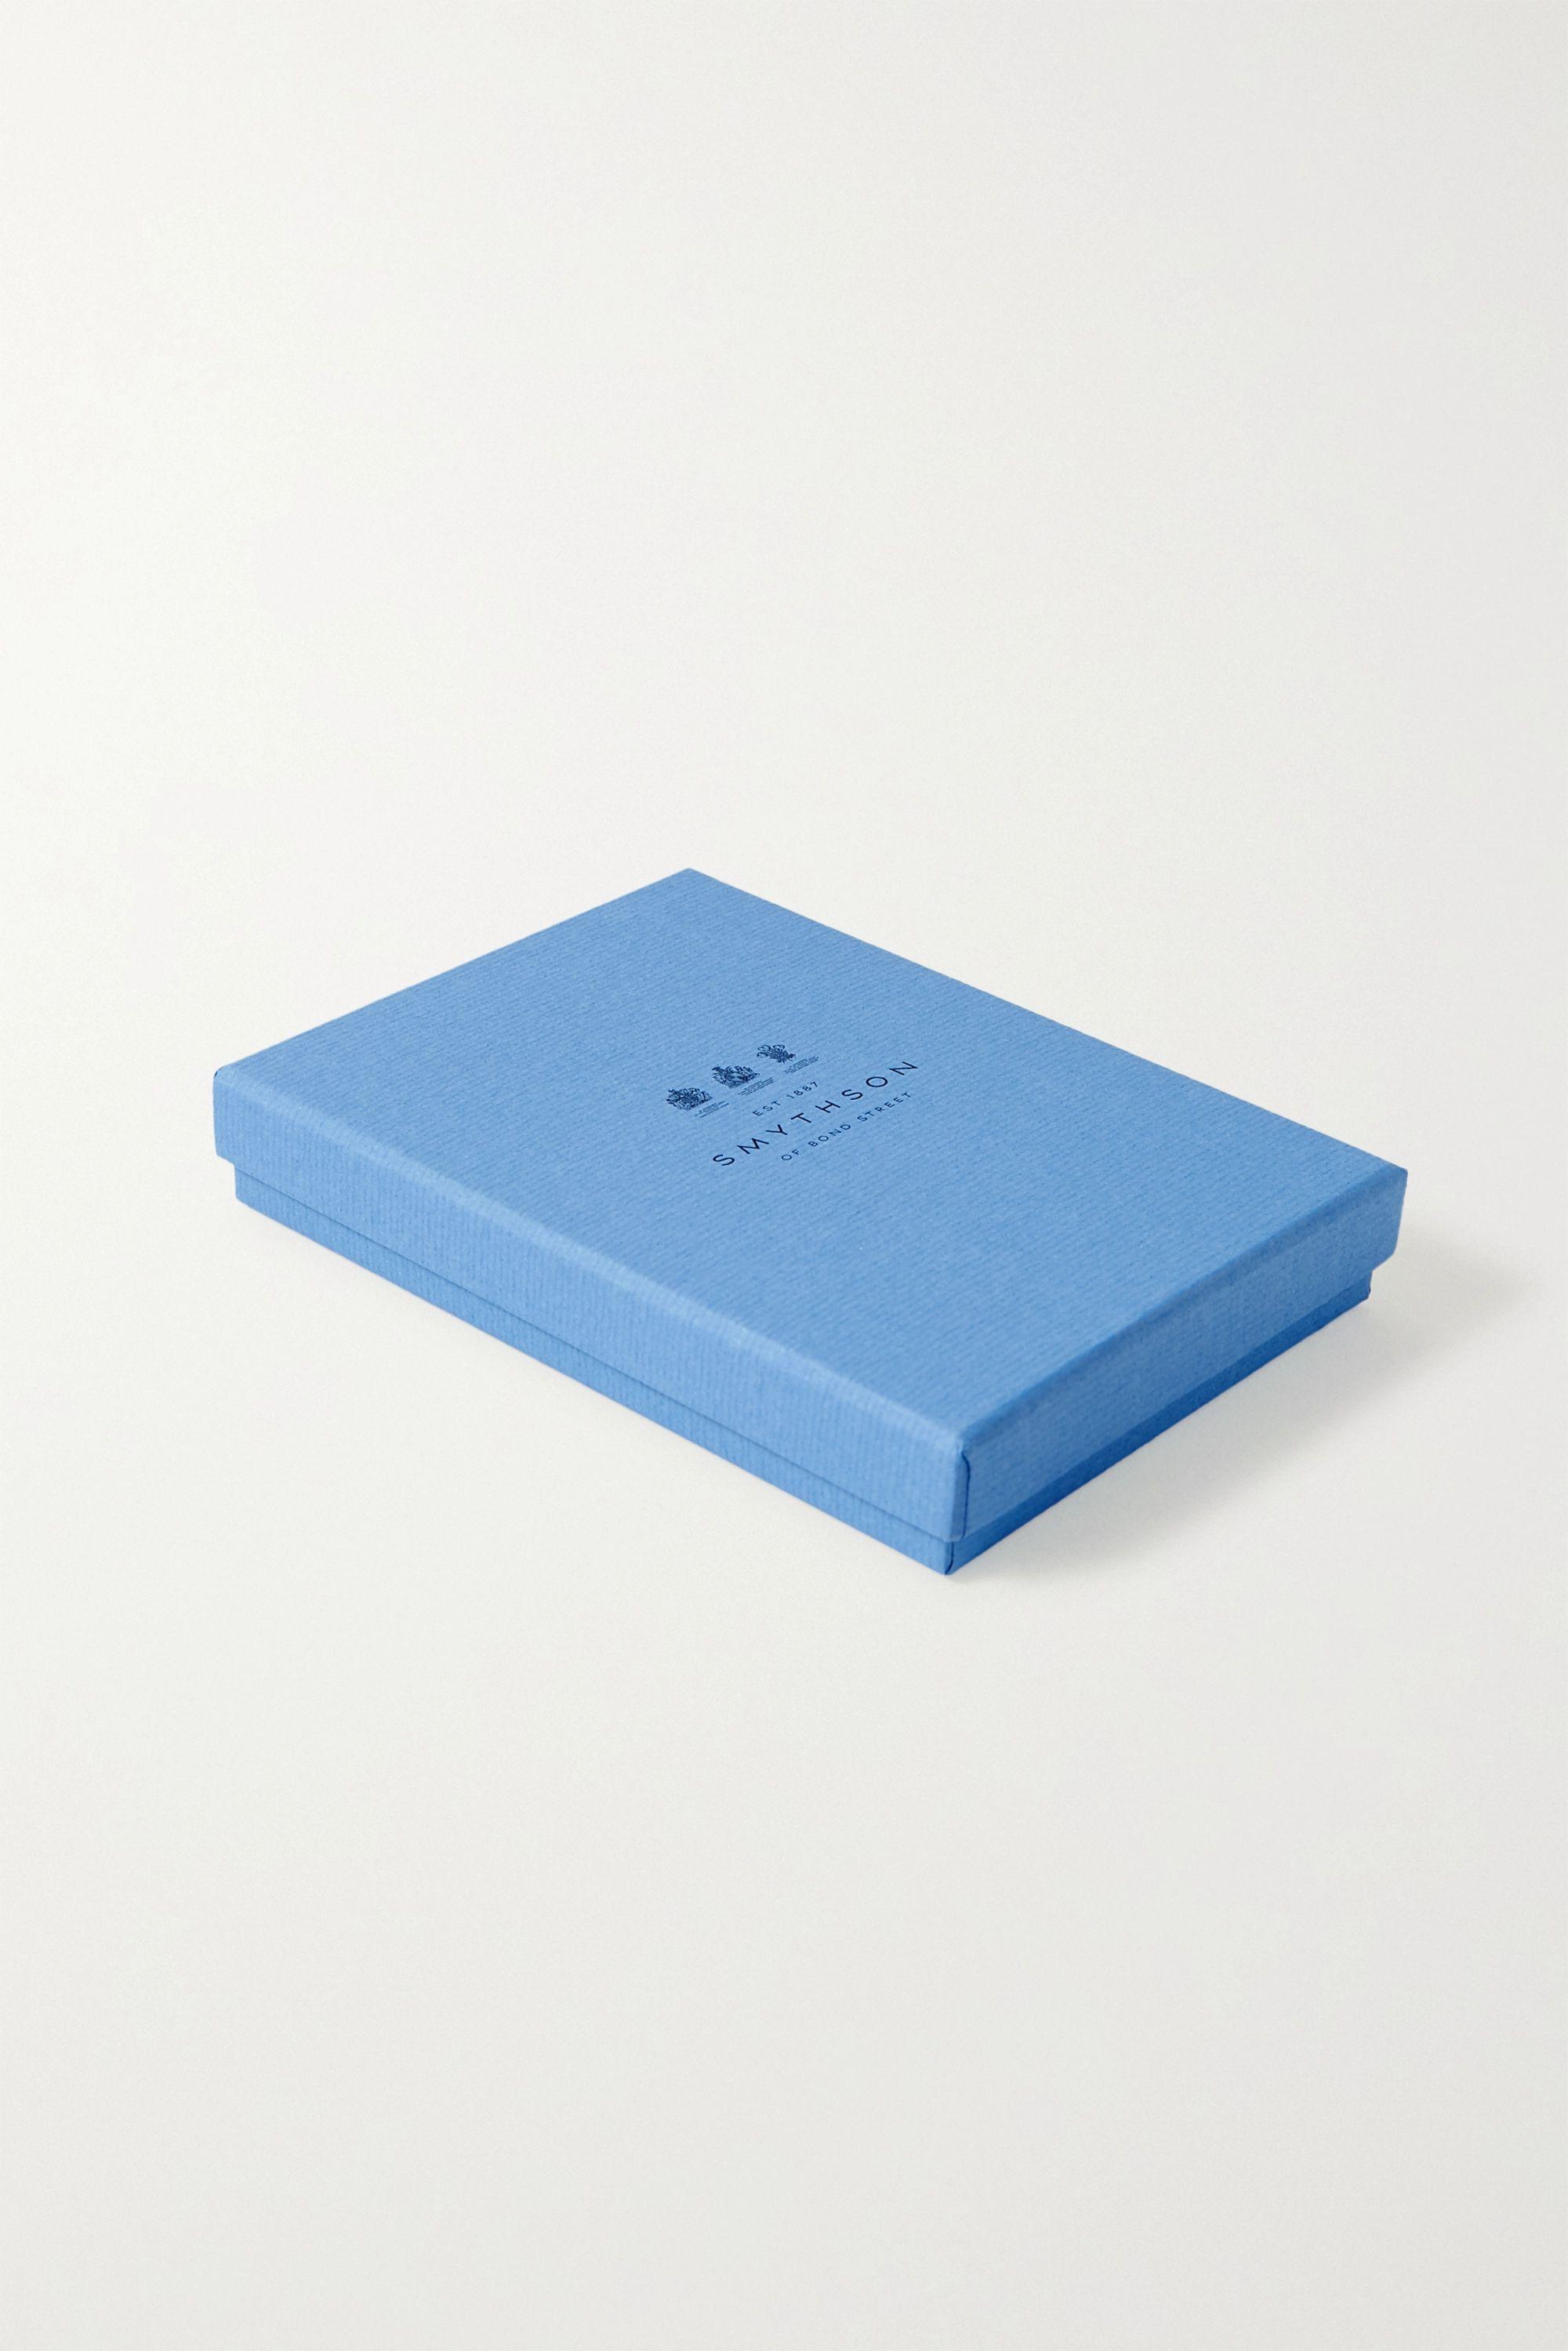 Smythson Love textured-leather notebook